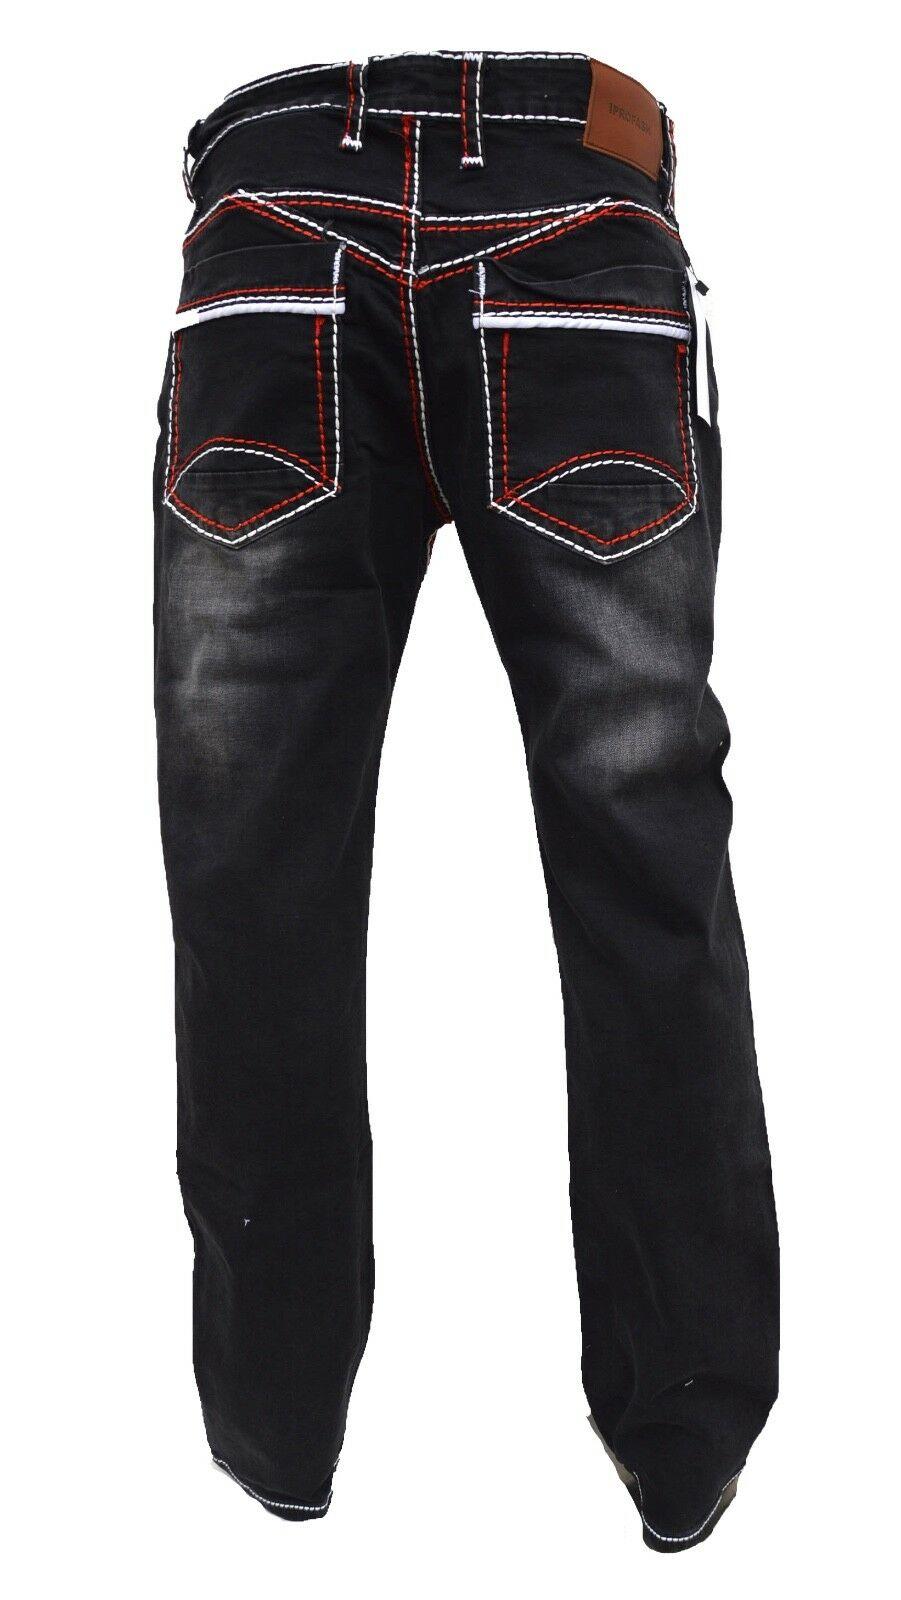 Herren-Jeans-Hose-Denim-KC-Black-Washed-Straight-Cut-Regular-Dicke-Naht-naehte Indexbild 19